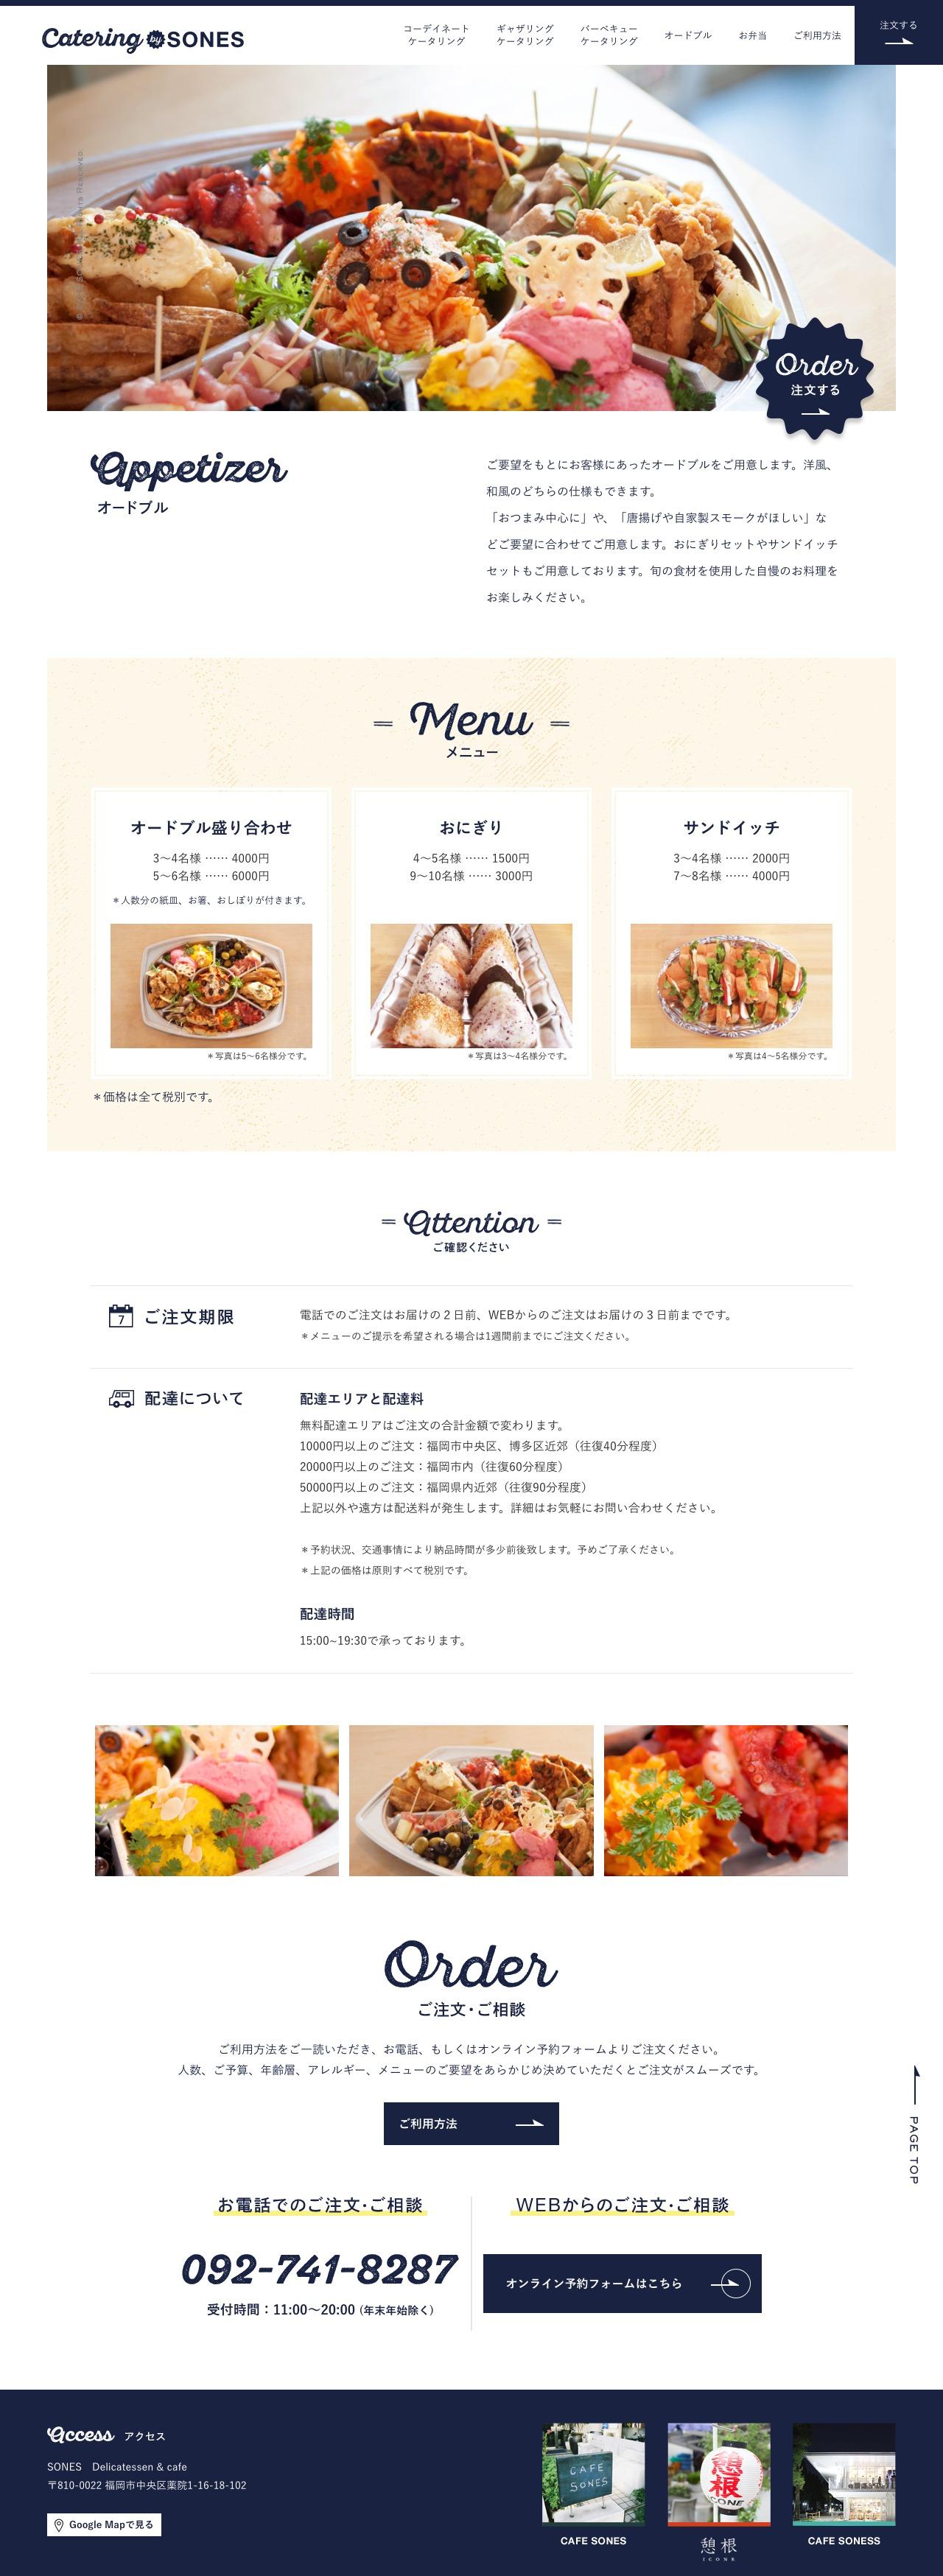 screencapture-sones-cc-catering-appetizer-2018-05-02-10_50_06